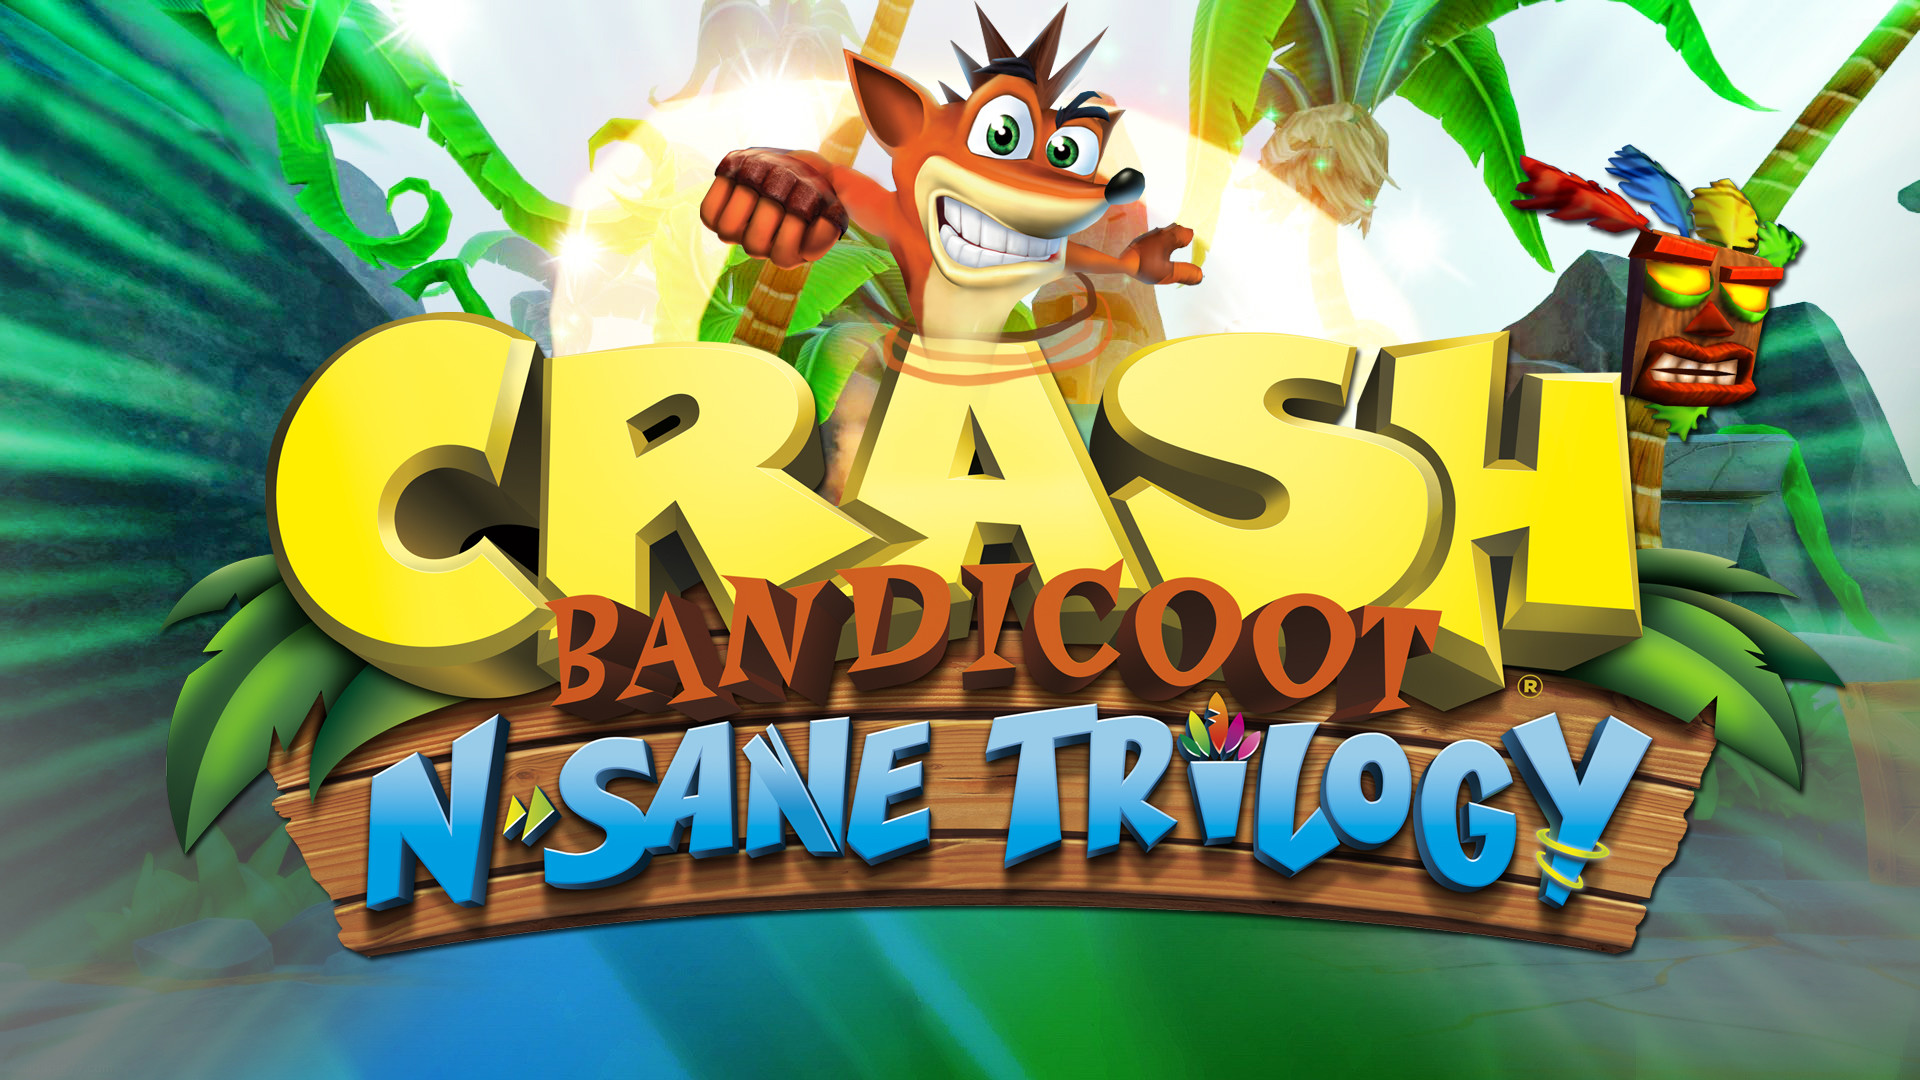 Crash Bandicoot Wallpapers (67+ Images